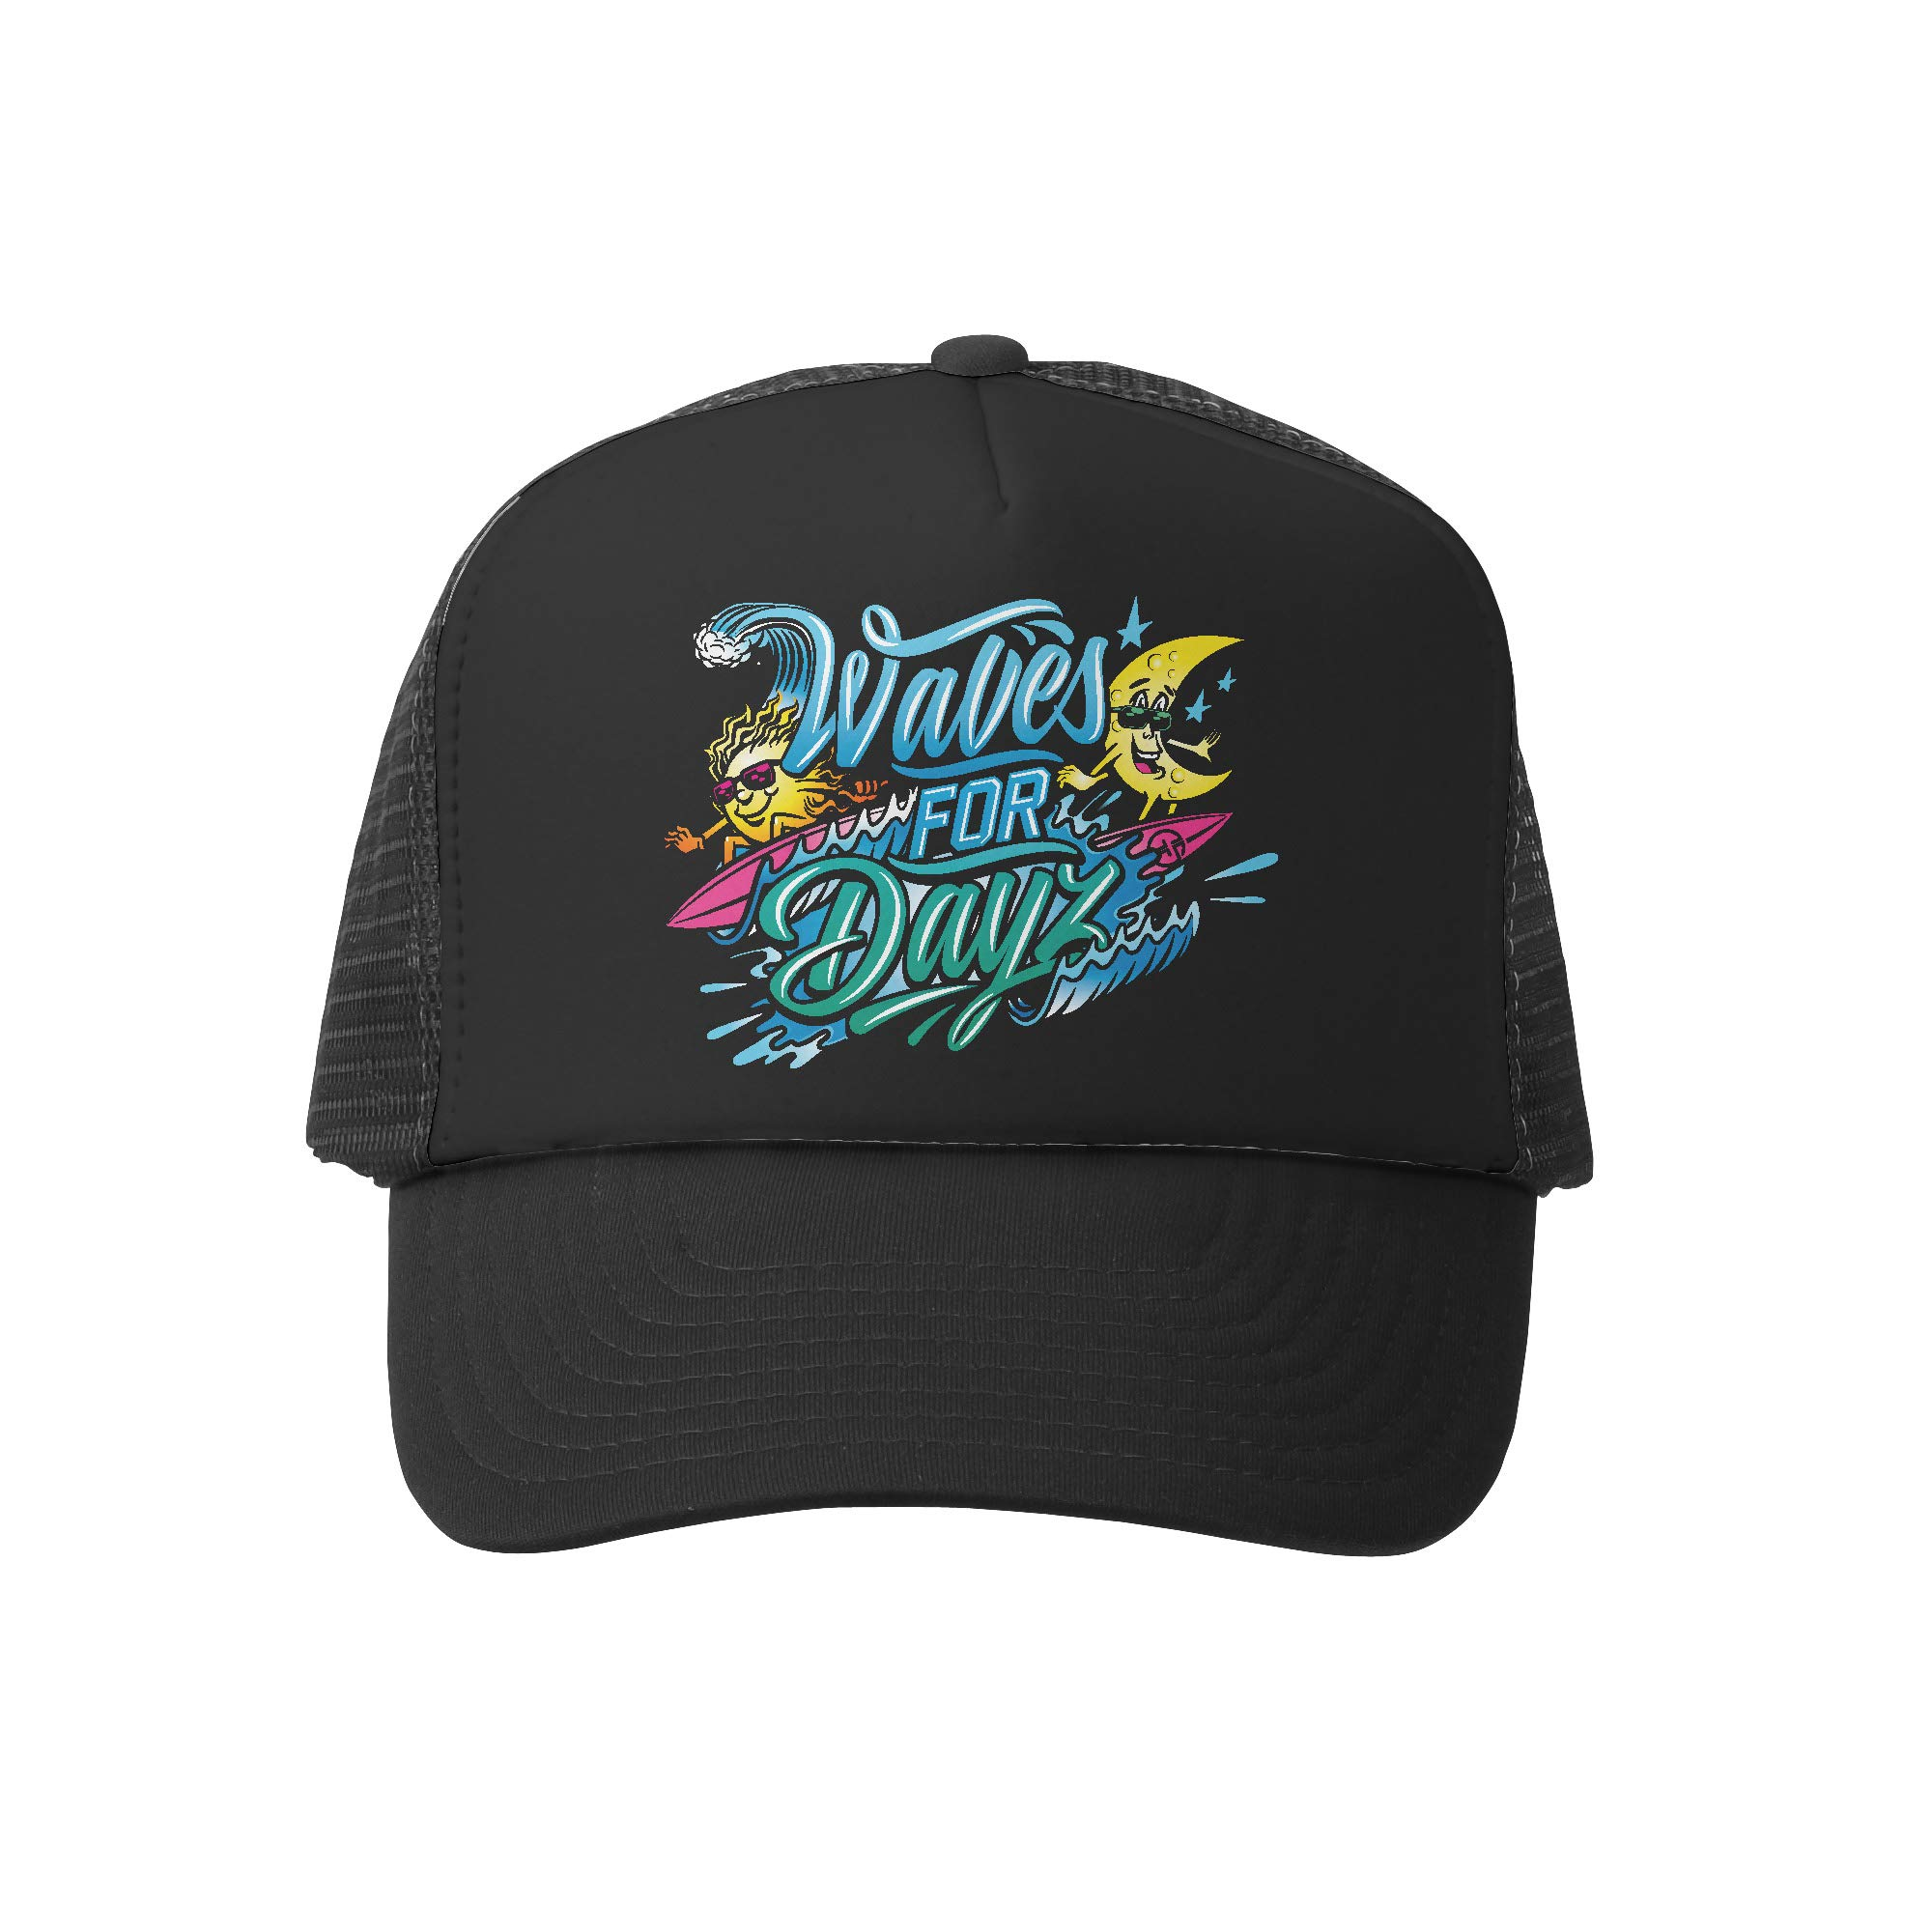 Grom Squad Kids Trucker Hat - Mesh Adjustable Baseball Cap for Boys & Girls - Baby, Infant, Toddler, School-Age Sizes (0-2yrs (Mini), Waves for DayZ